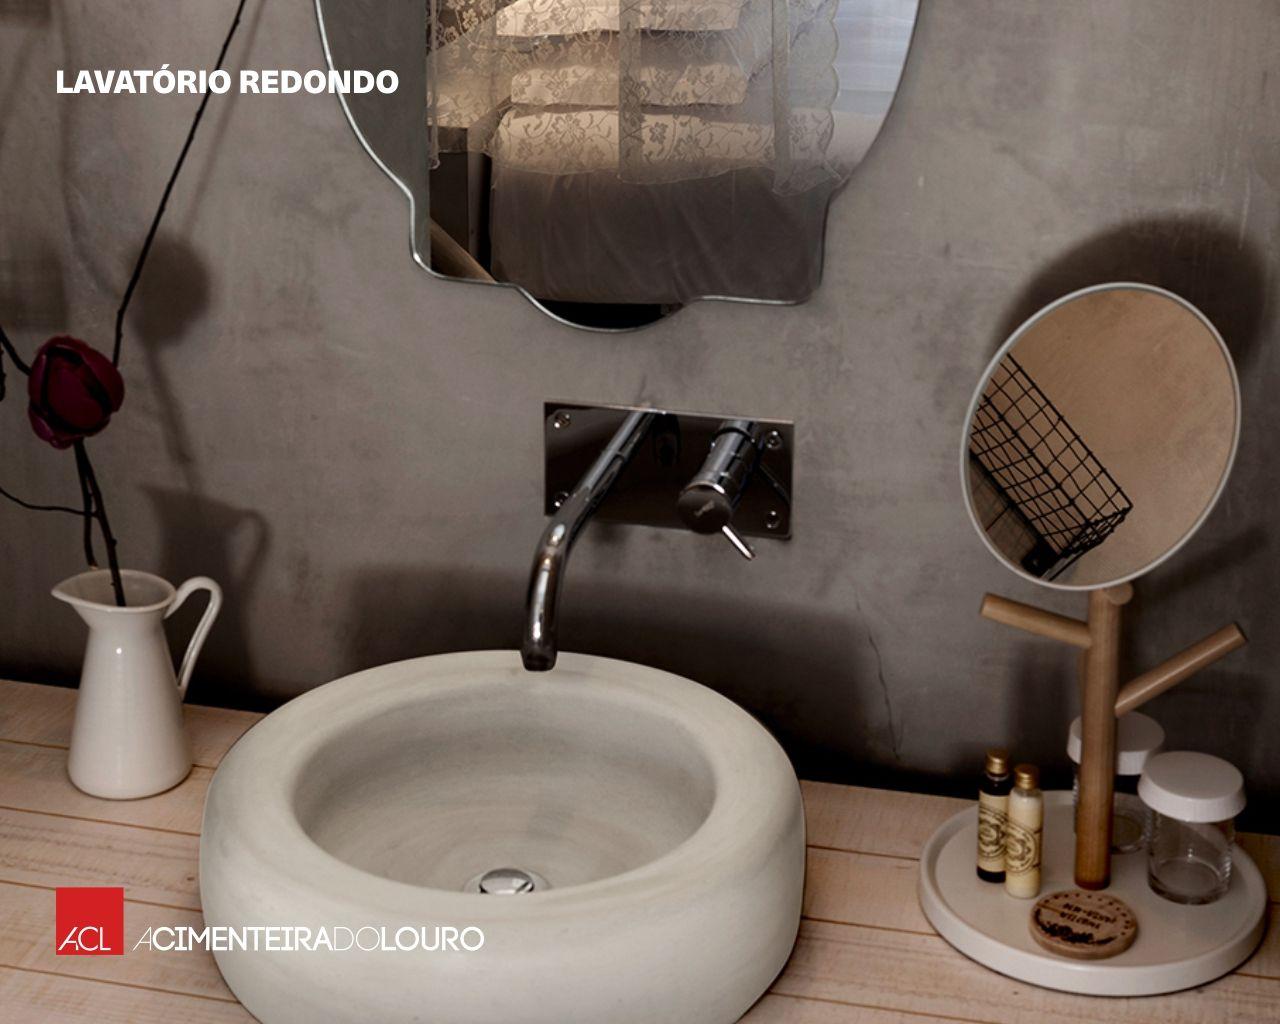 A DIFERENÇA ESTÁ NOS DETALHES! Lavatórios de Betão ACL Disponíveis em 3 cores -- THE DIFFERENCE IS IN THE DETAILS! ACL Concrete washbasin Available in 3 colors